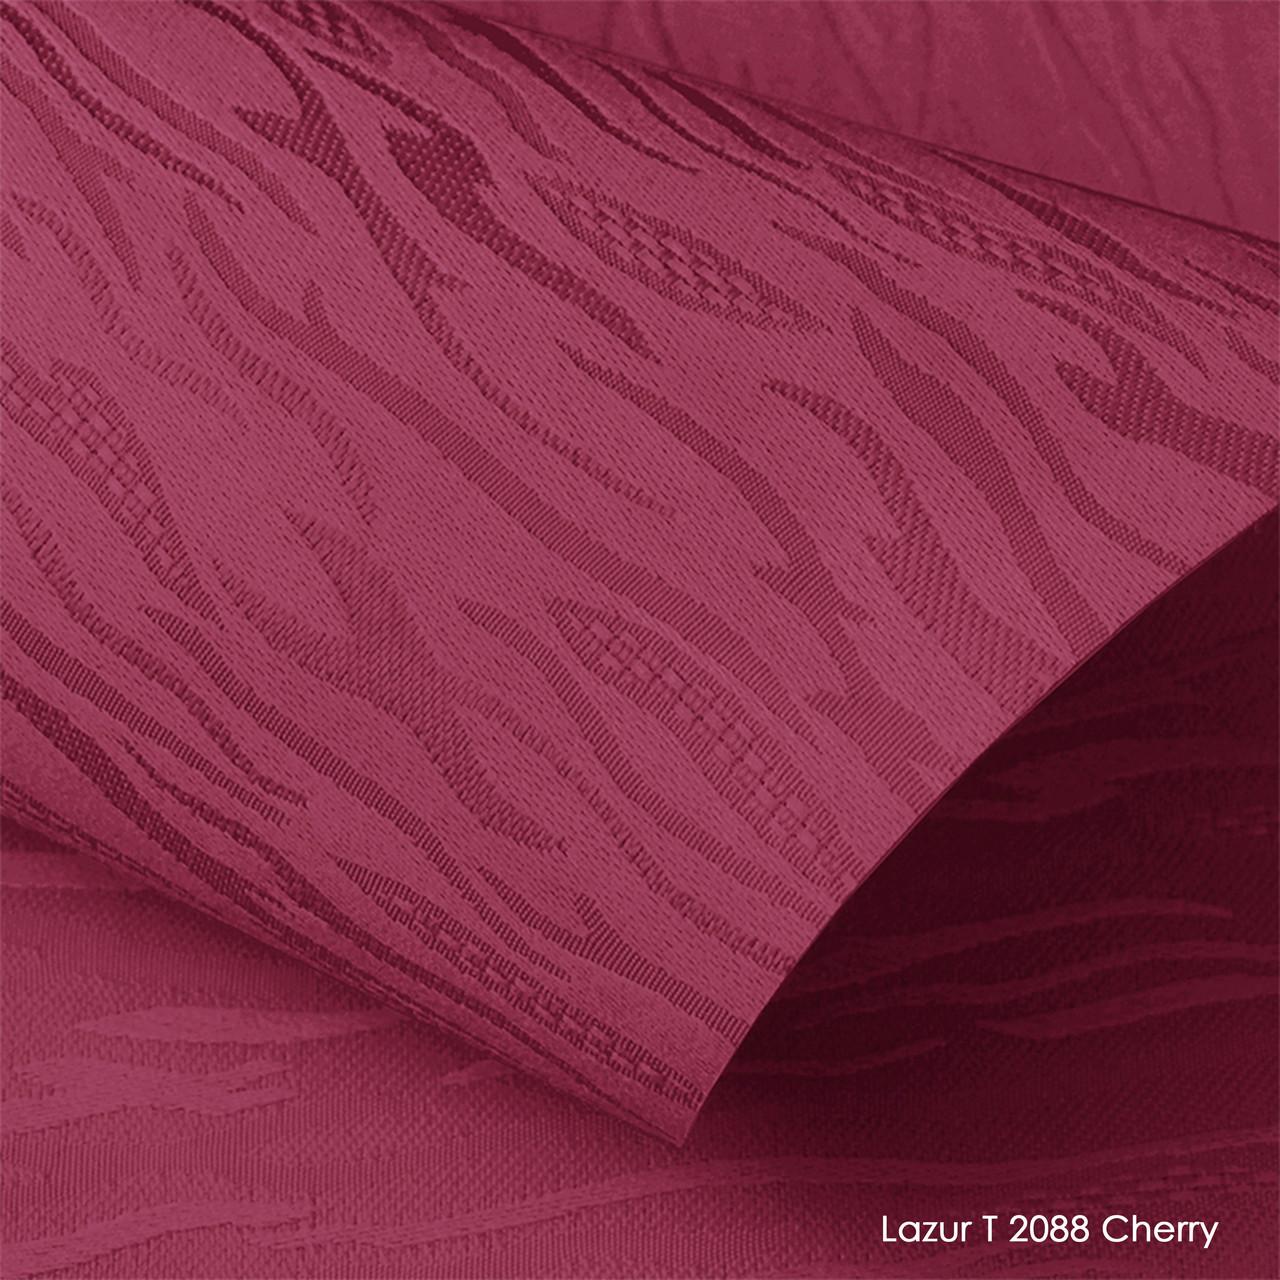 Lazur T 2088 Chery